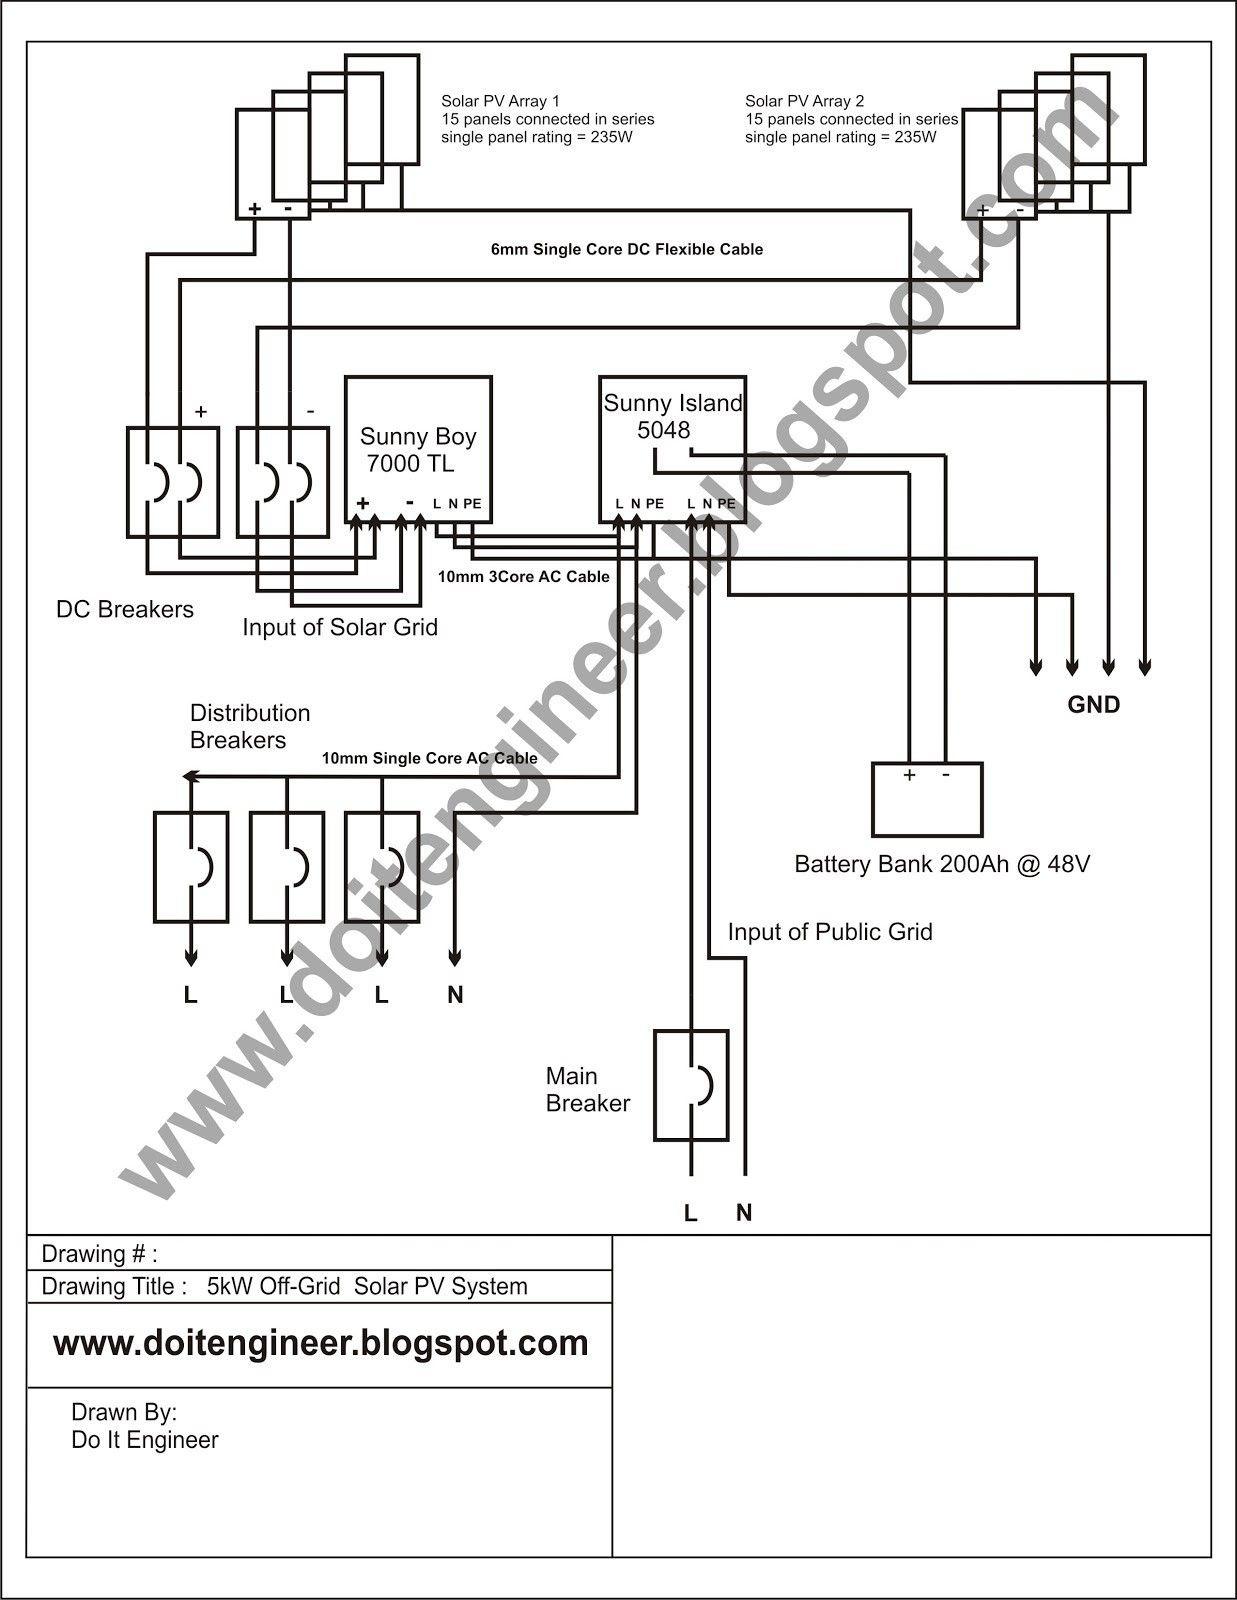 New Inverter Wiring Diagram Pdf  Diagram  Diagramsample